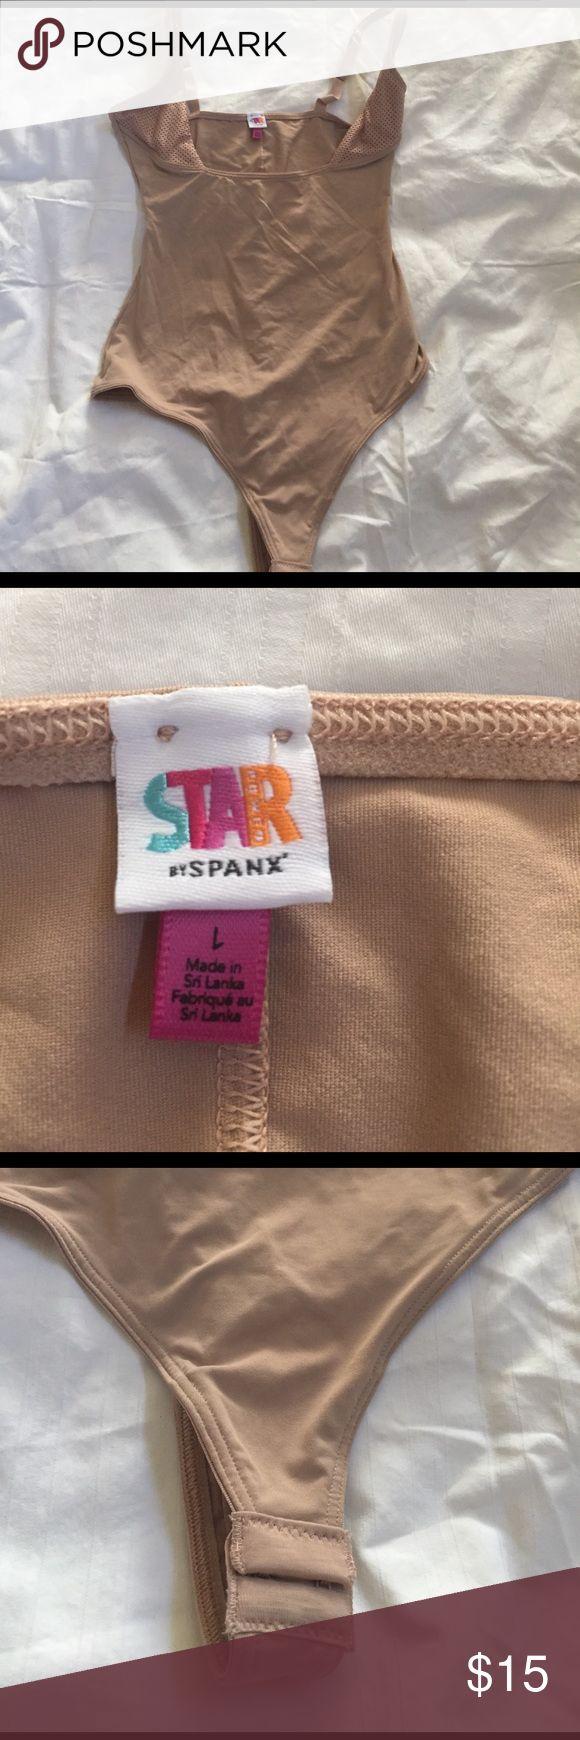 Spanx open bust bodysuit Spanx open bust bodysuit.  Snap crotch thong back.  Adjustable straps.  Never worn. SPANX Intimates & Sleepwear Shapewear